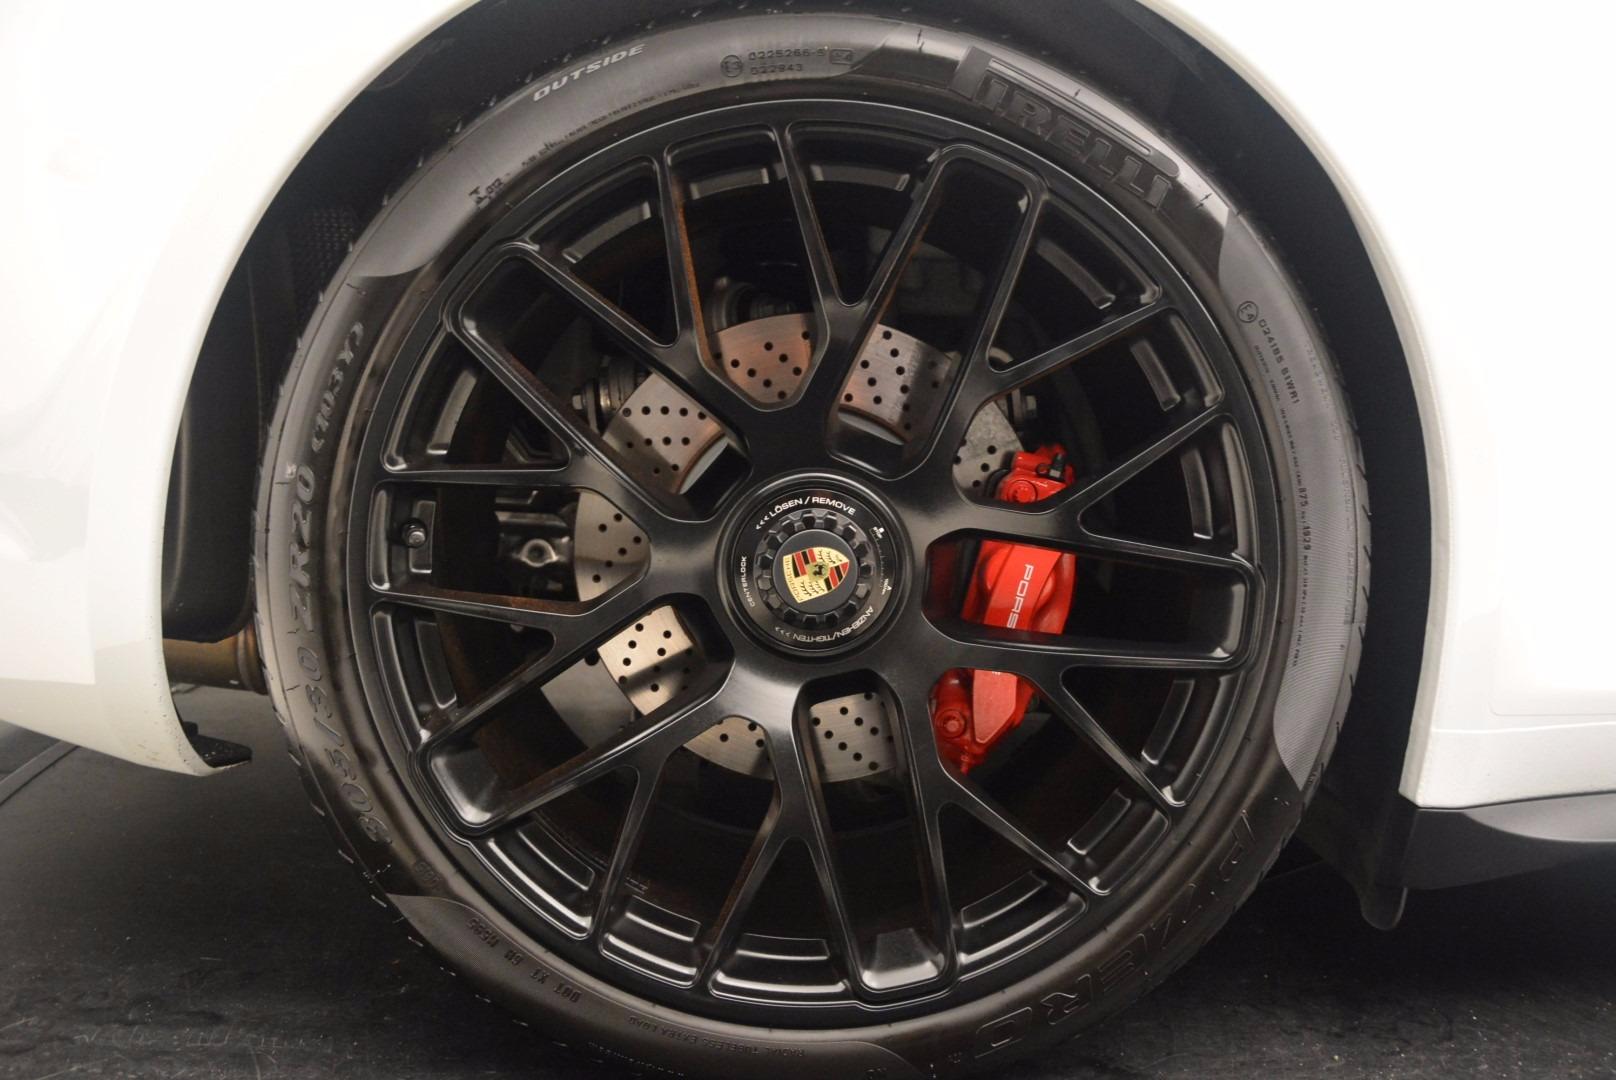 Used 2015 Porsche 911 Carrera GTS For Sale In Greenwich, CT 1444_p14